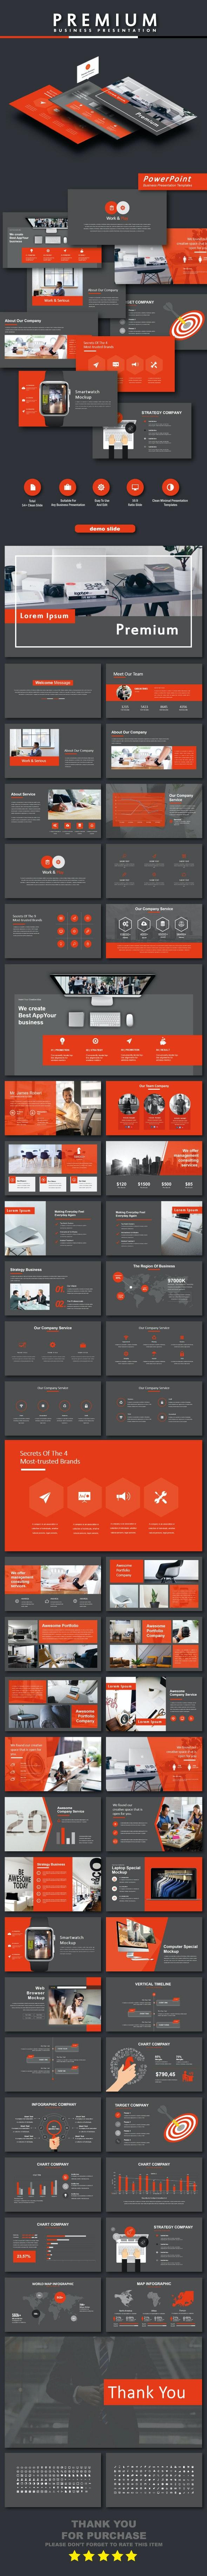 Premium Business PowerPoint Templates - Business PowerPoint Templates